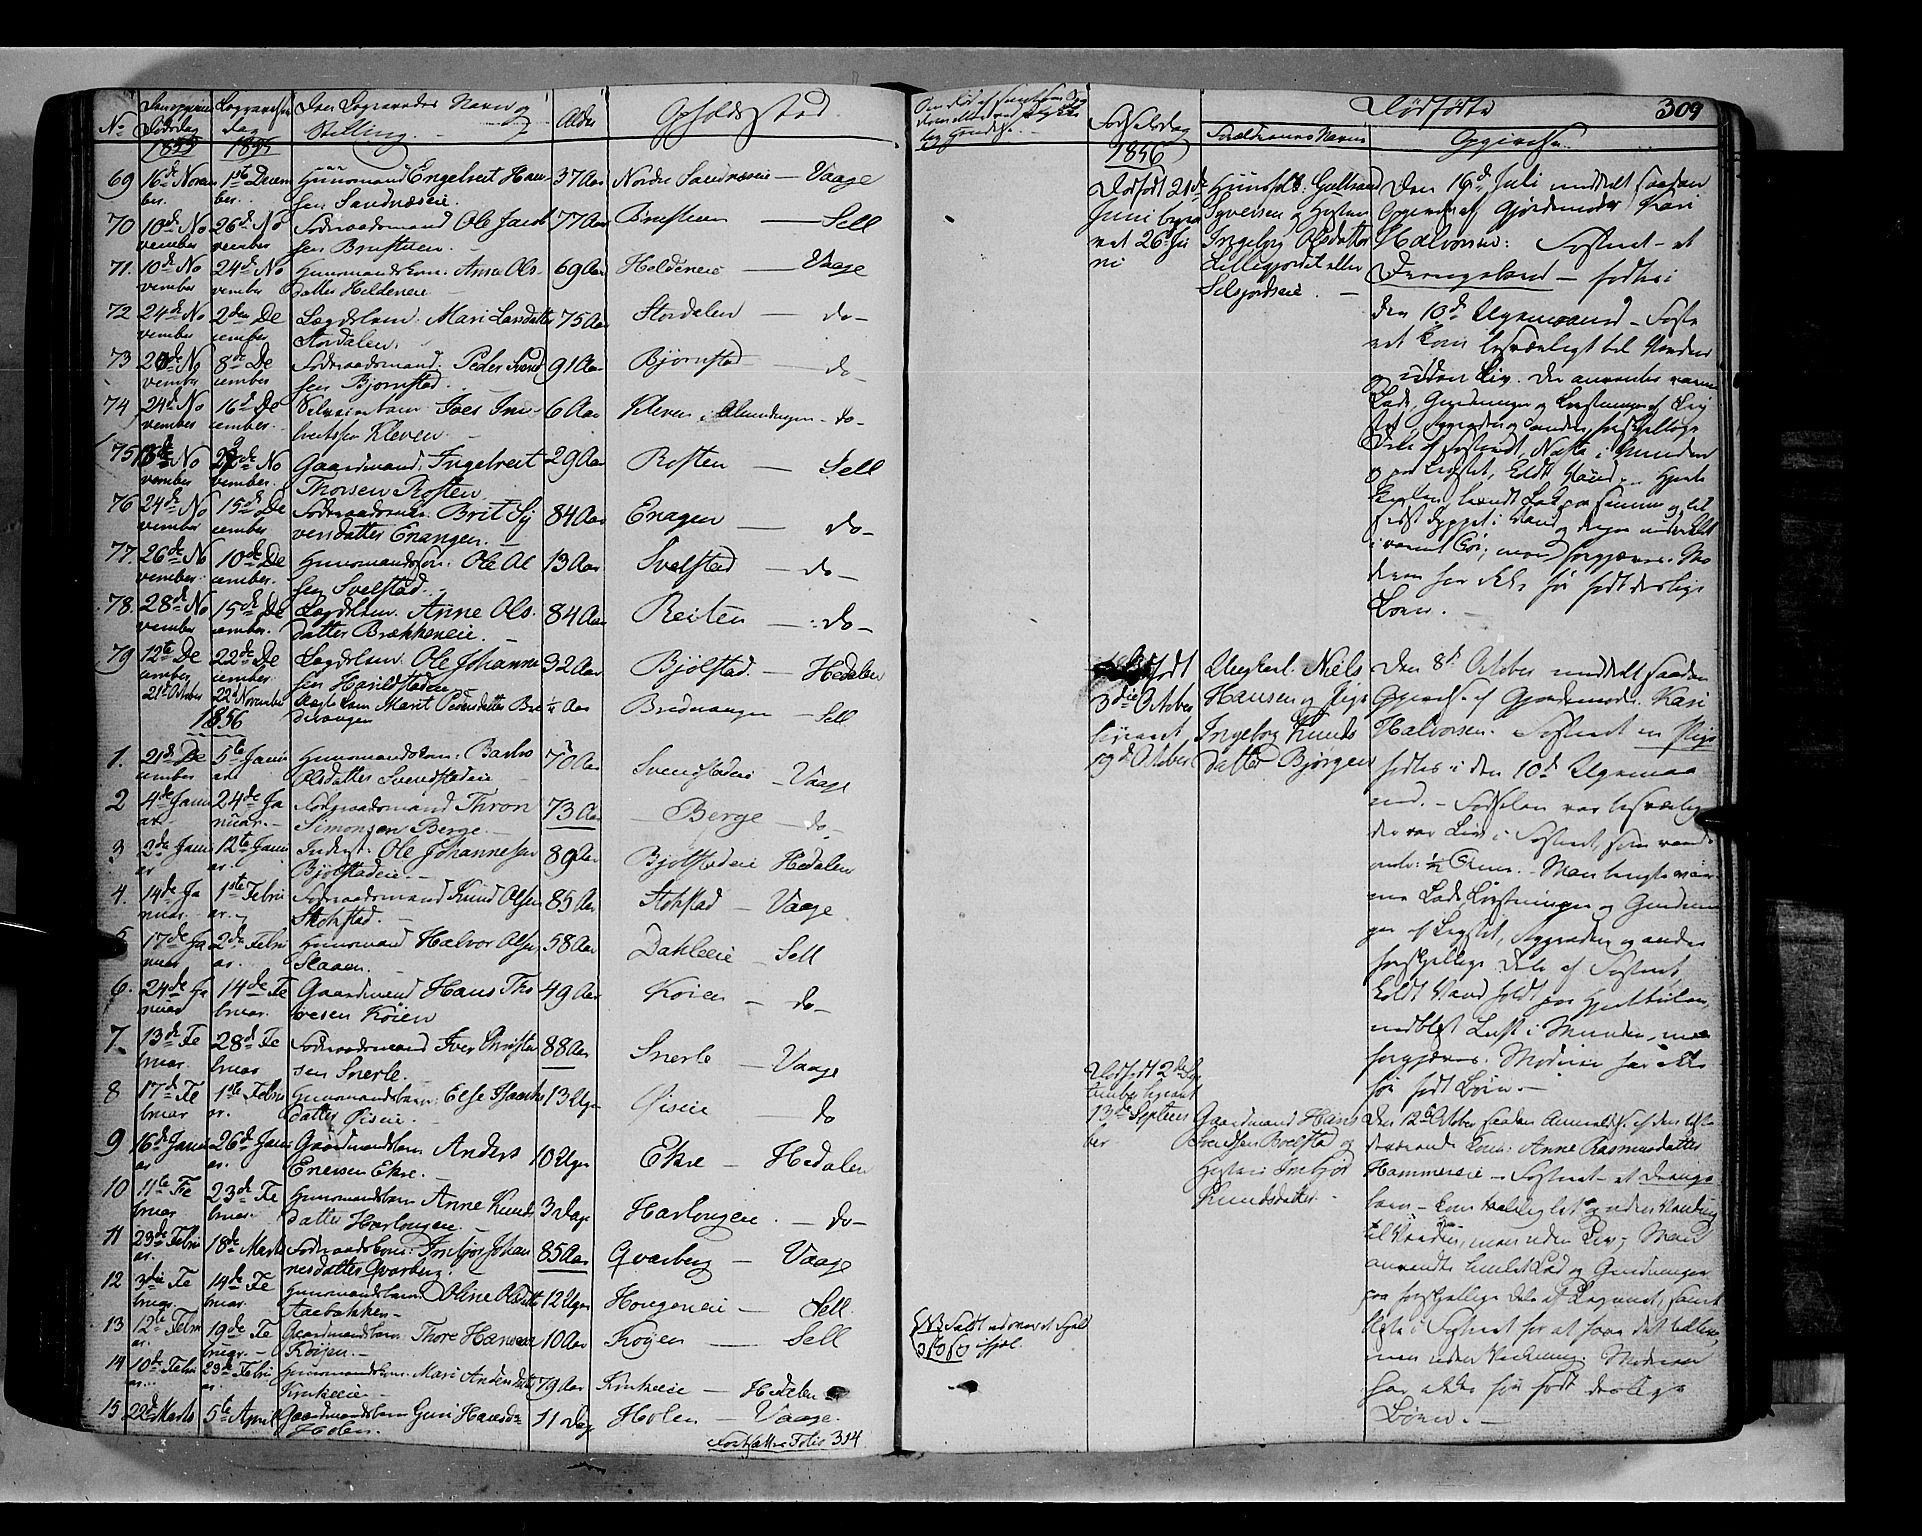 SAH, Vågå prestekontor, Ministerialbok nr. 5 /1, 1842-1856, s. 309